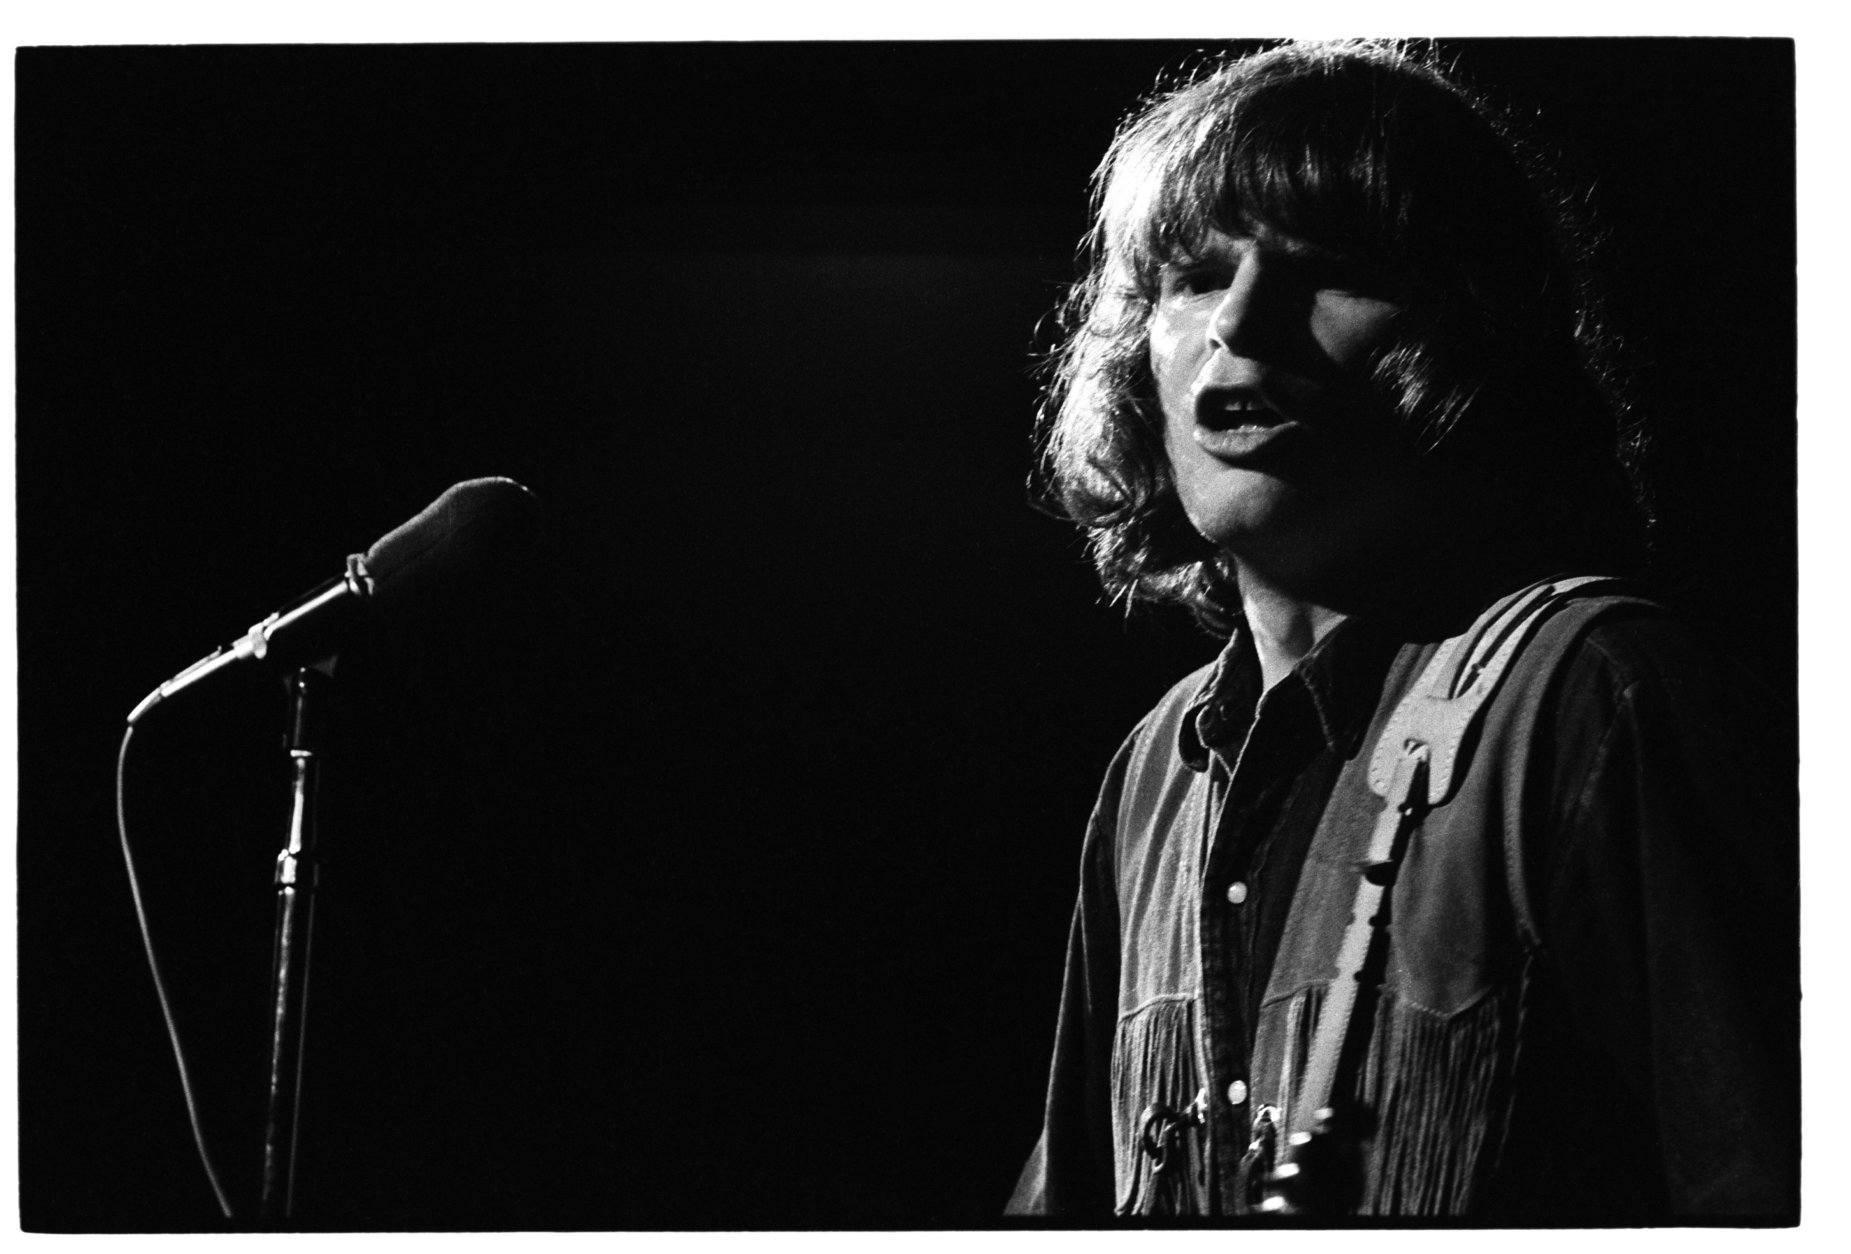 John Fogerty at Woodstock